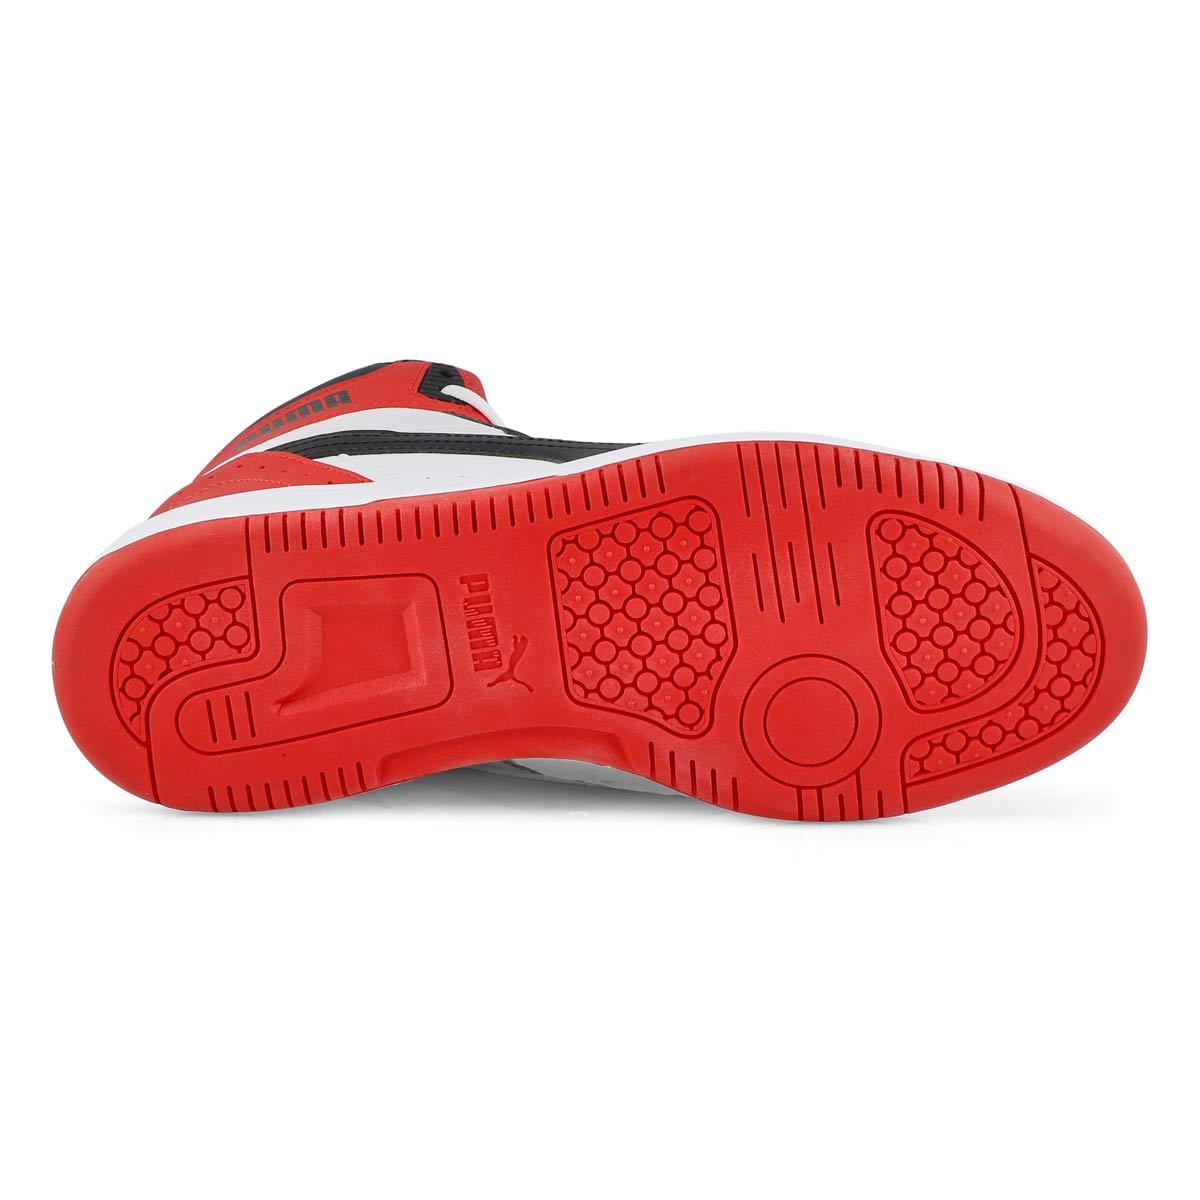 Men's Rebound Joy Sneaker - Black/ Red